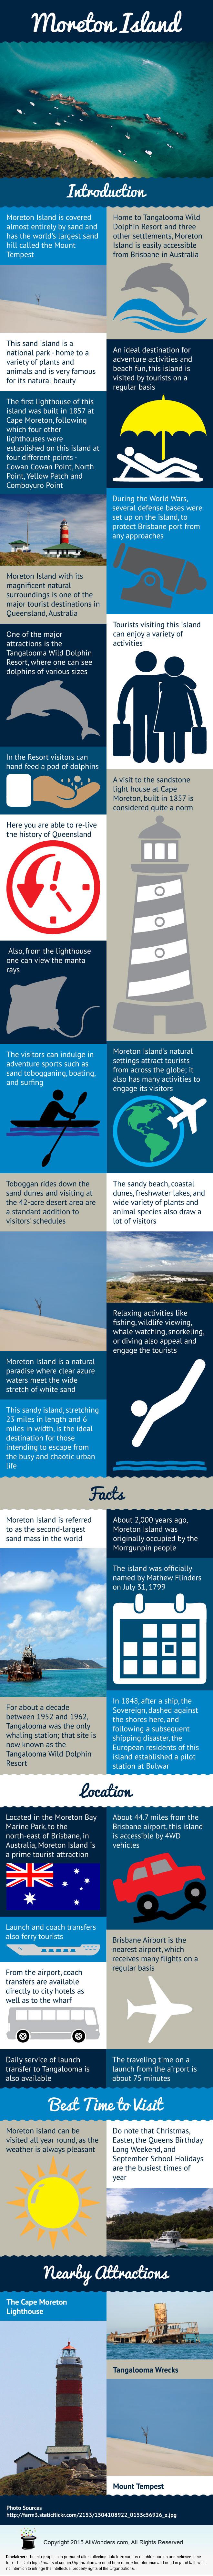 Moreton Island Infographic